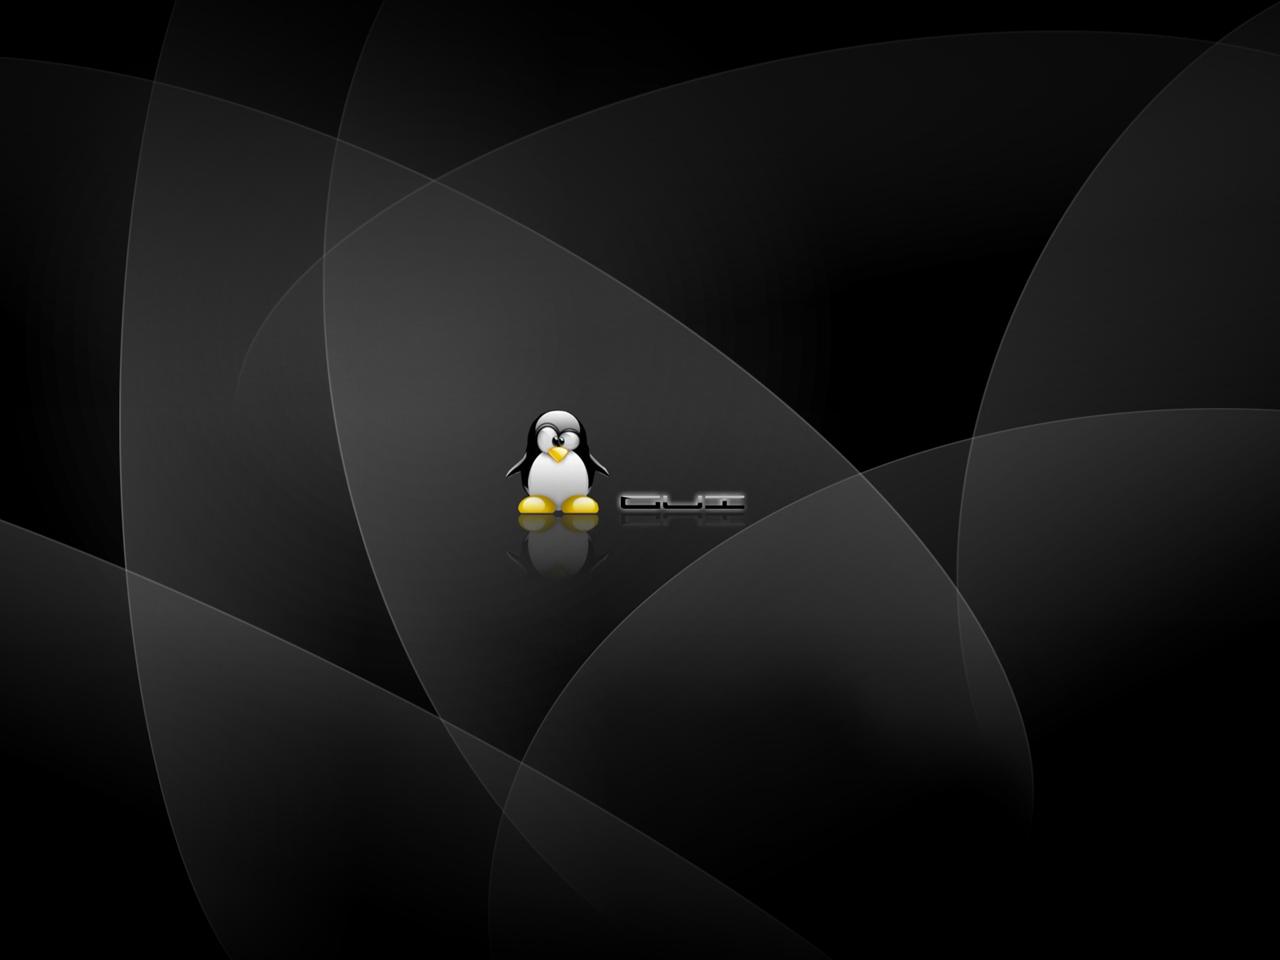 desktop wallpaper hitam, latar belakang desktop wallpaper hitam, wallpaper hitam desktop windows 7, unduhan desktop wallpaper hitam, desktop wallpaper hitam putih,